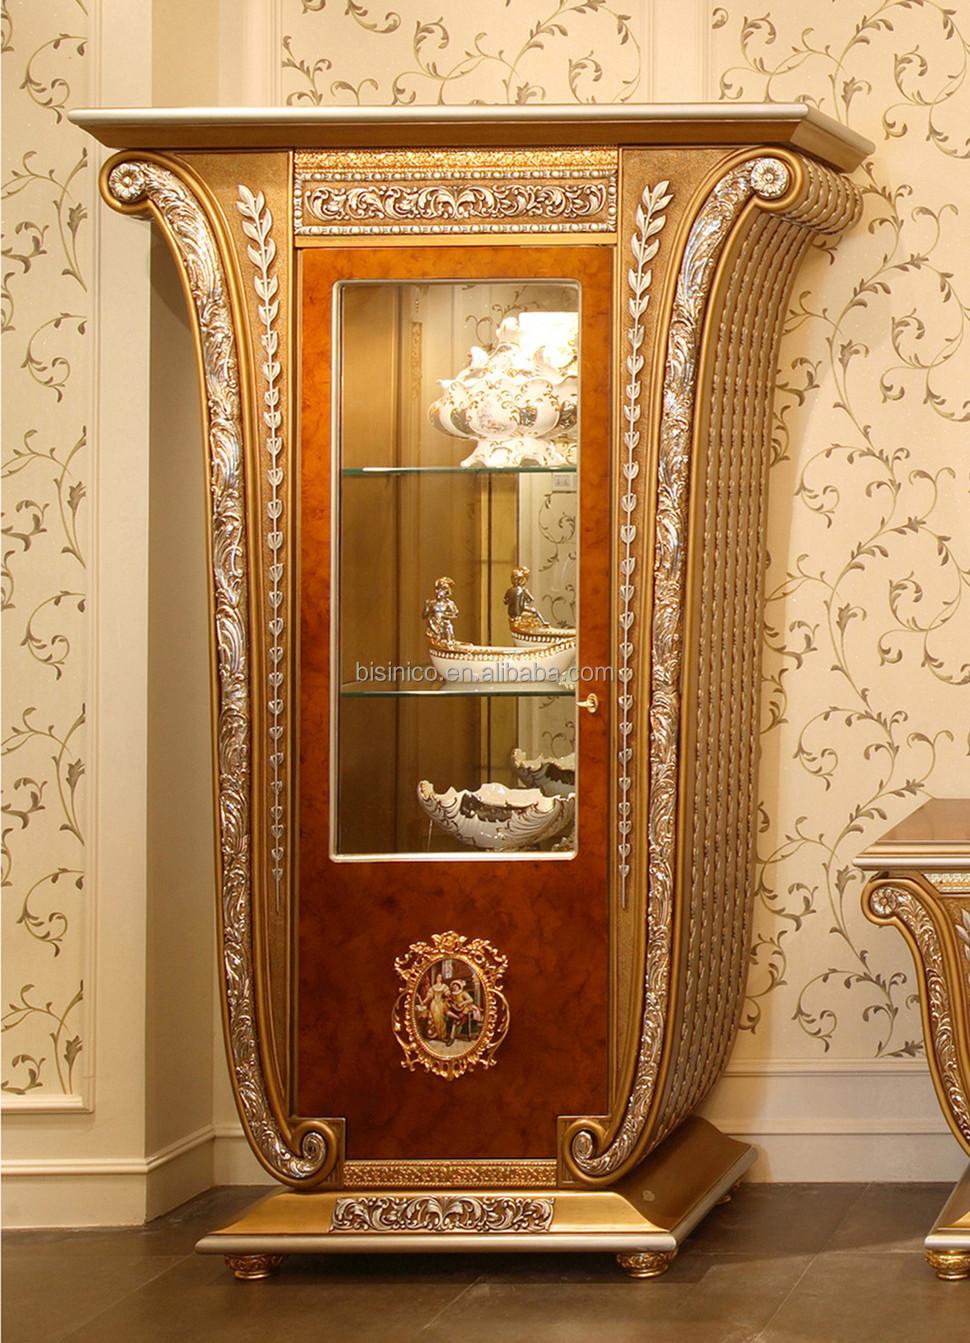 Bf03 0100047 10000 45 W Jpg Single Door Display Cabinet